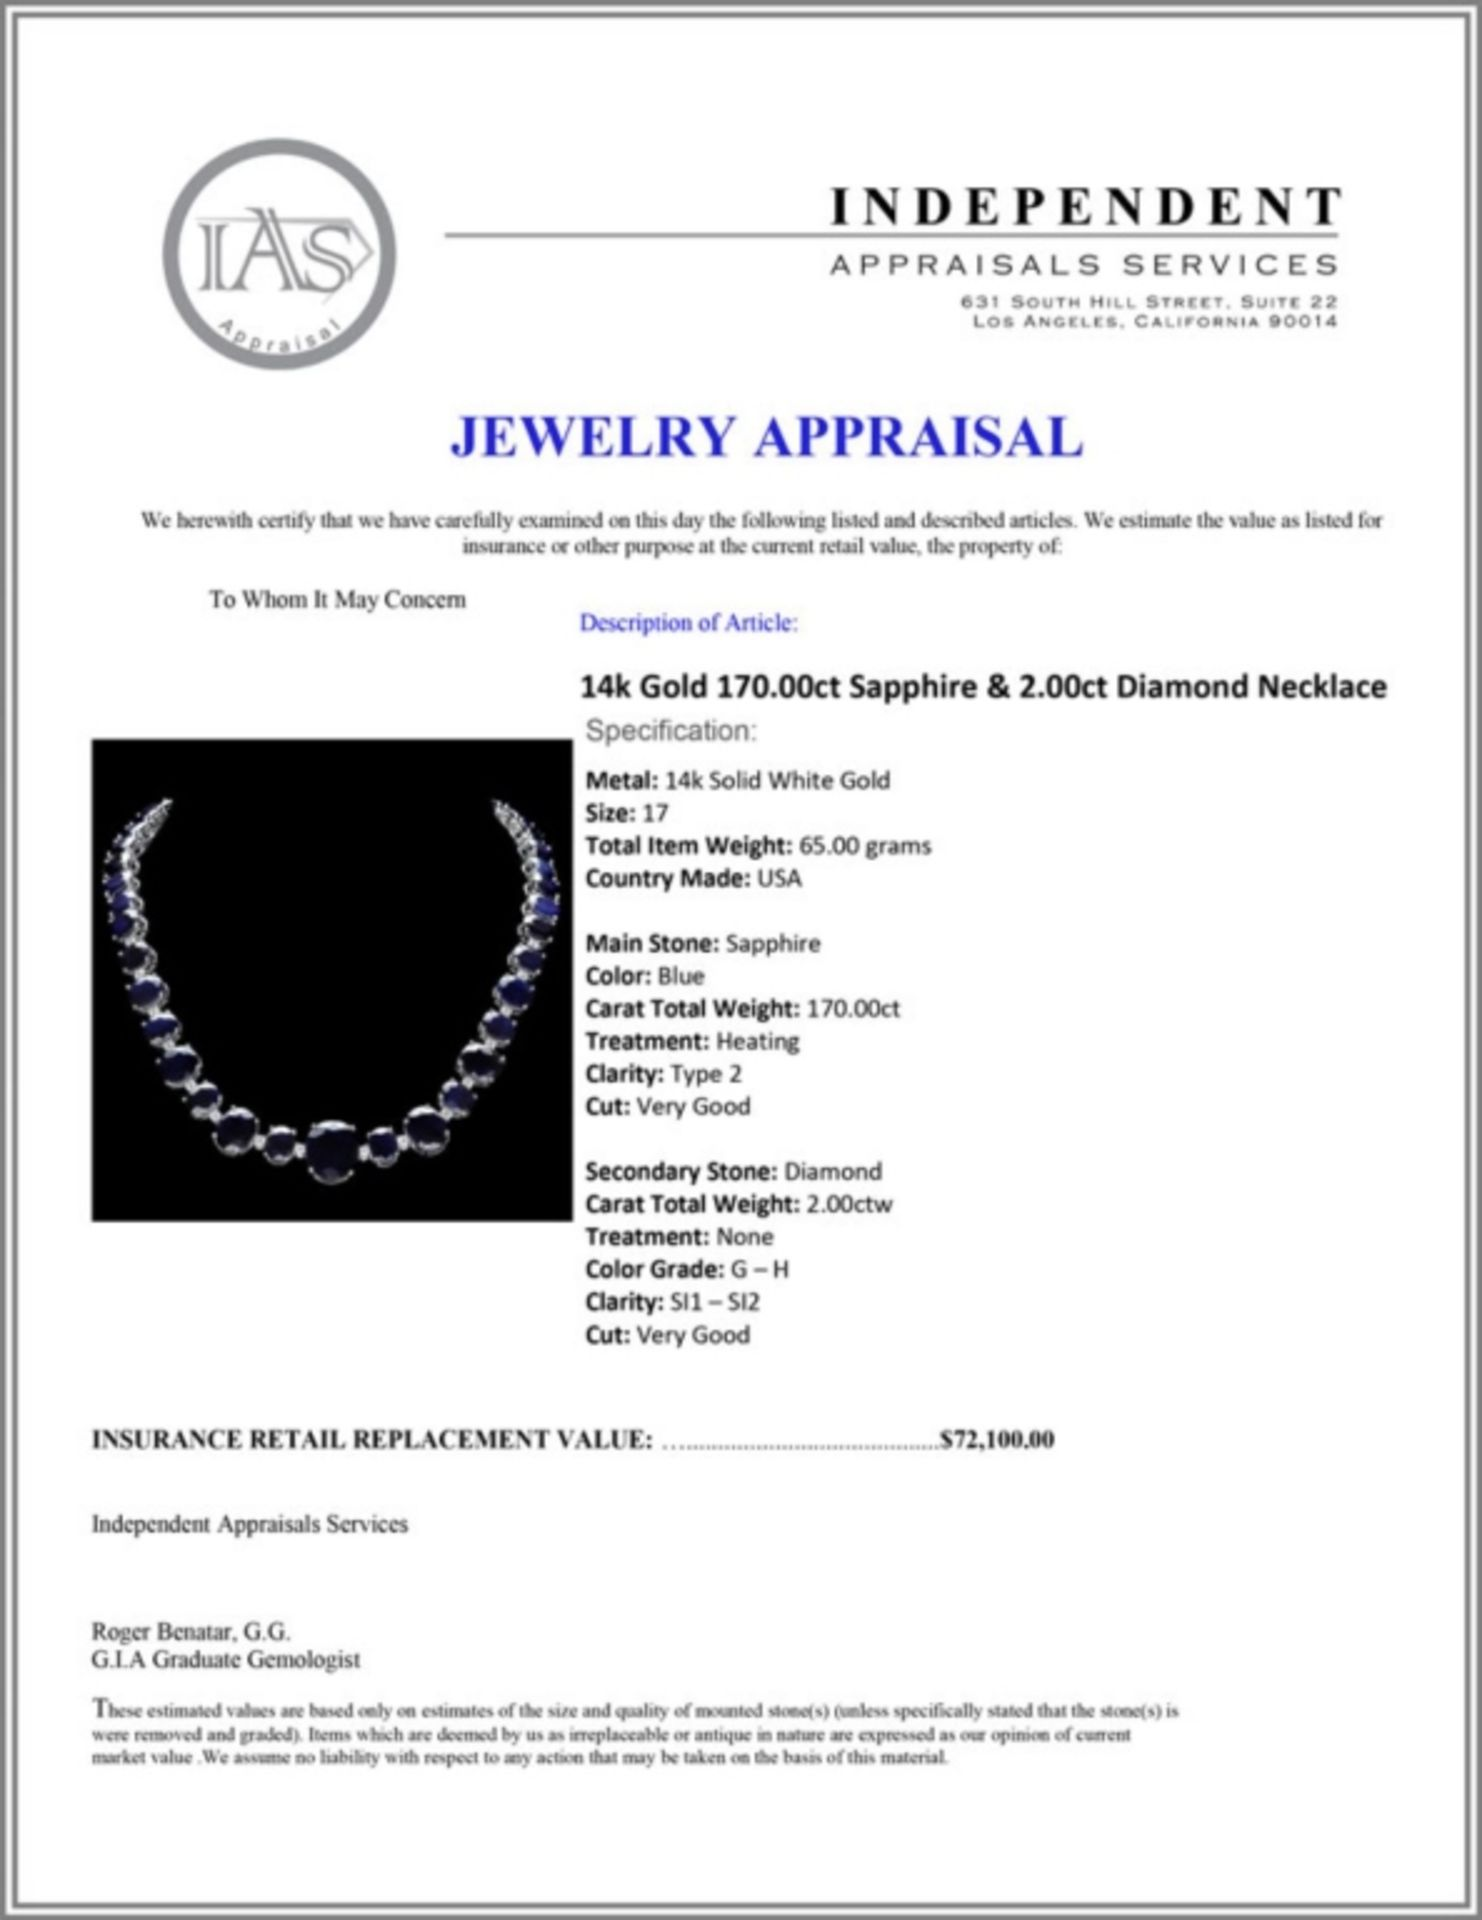 `14k Gold 170.00ct Sapphire & 2.00ct Diamond Neckl - Image 5 of 5